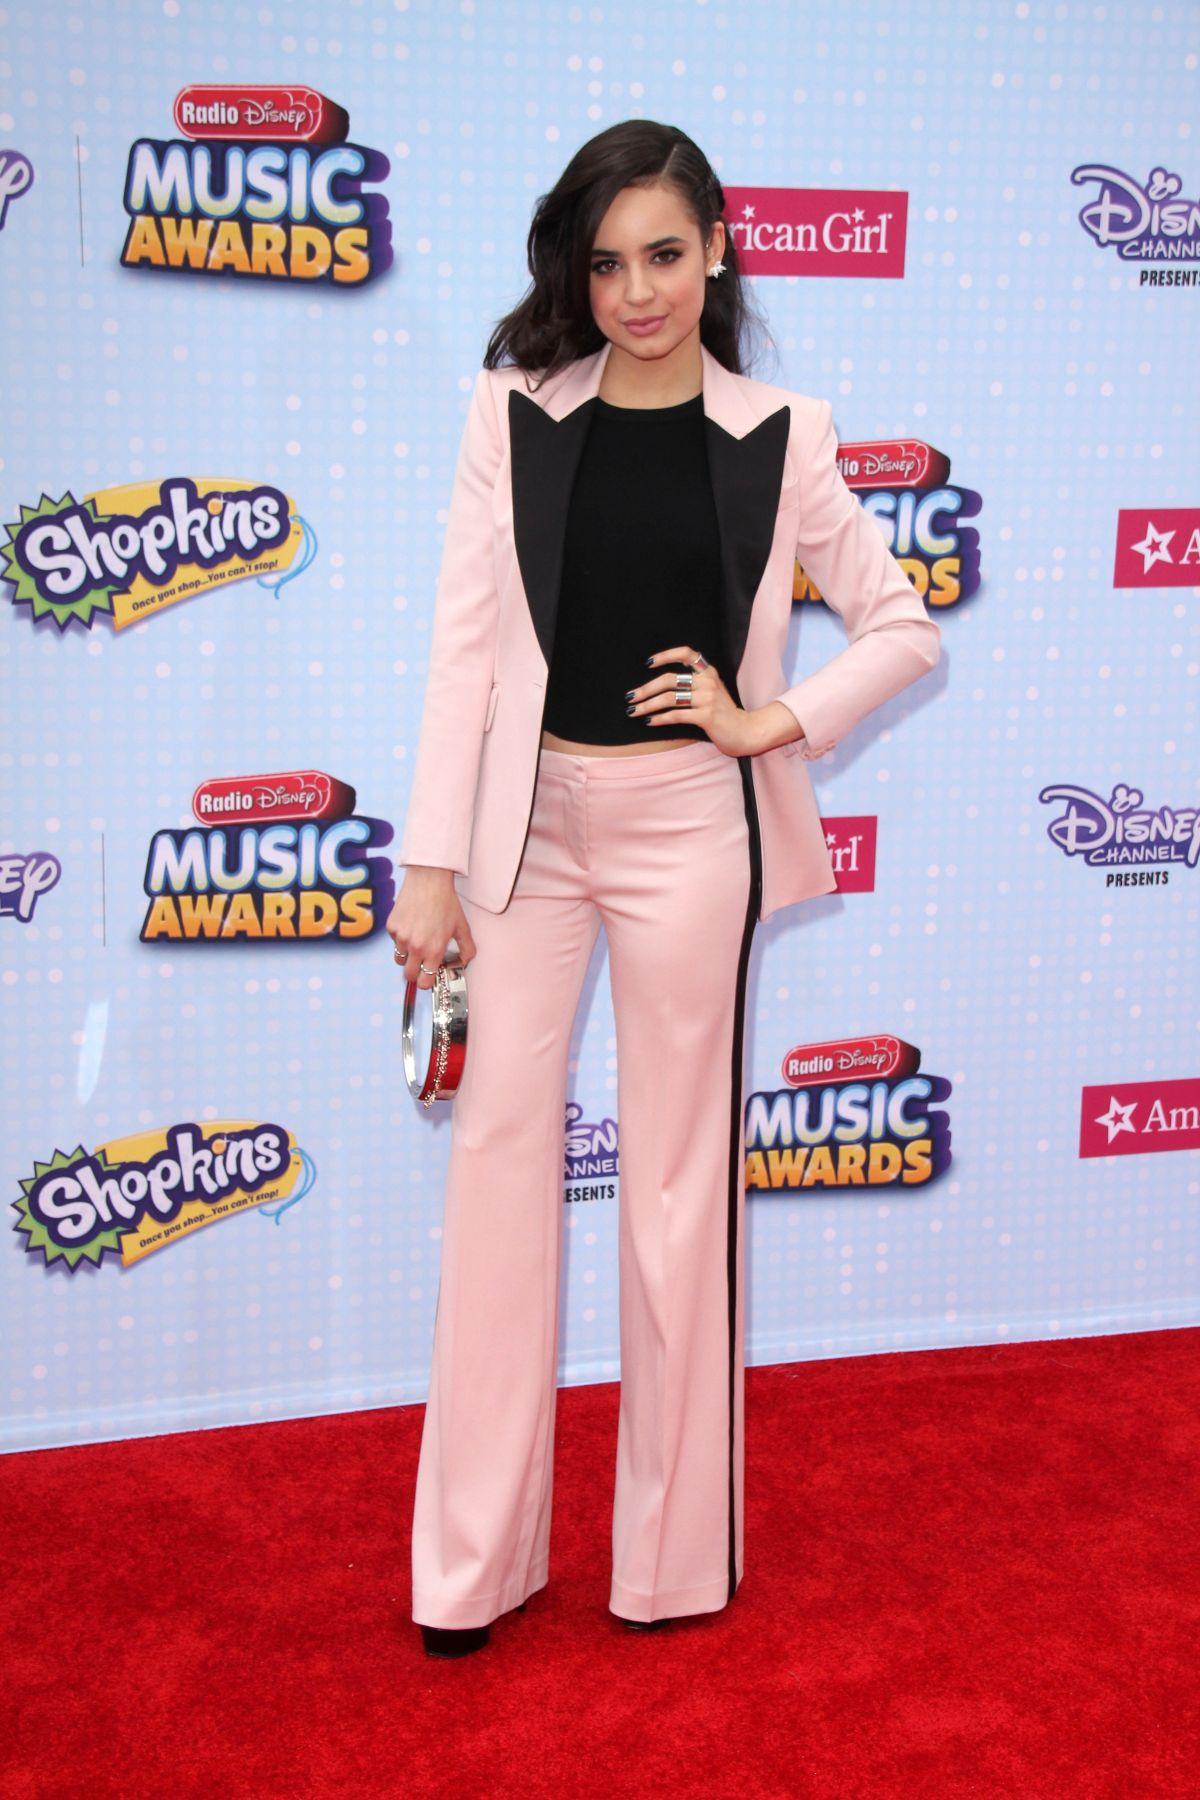 SOFIA CARSON at 2015 Radio Disney Music Awards in Los Angeles